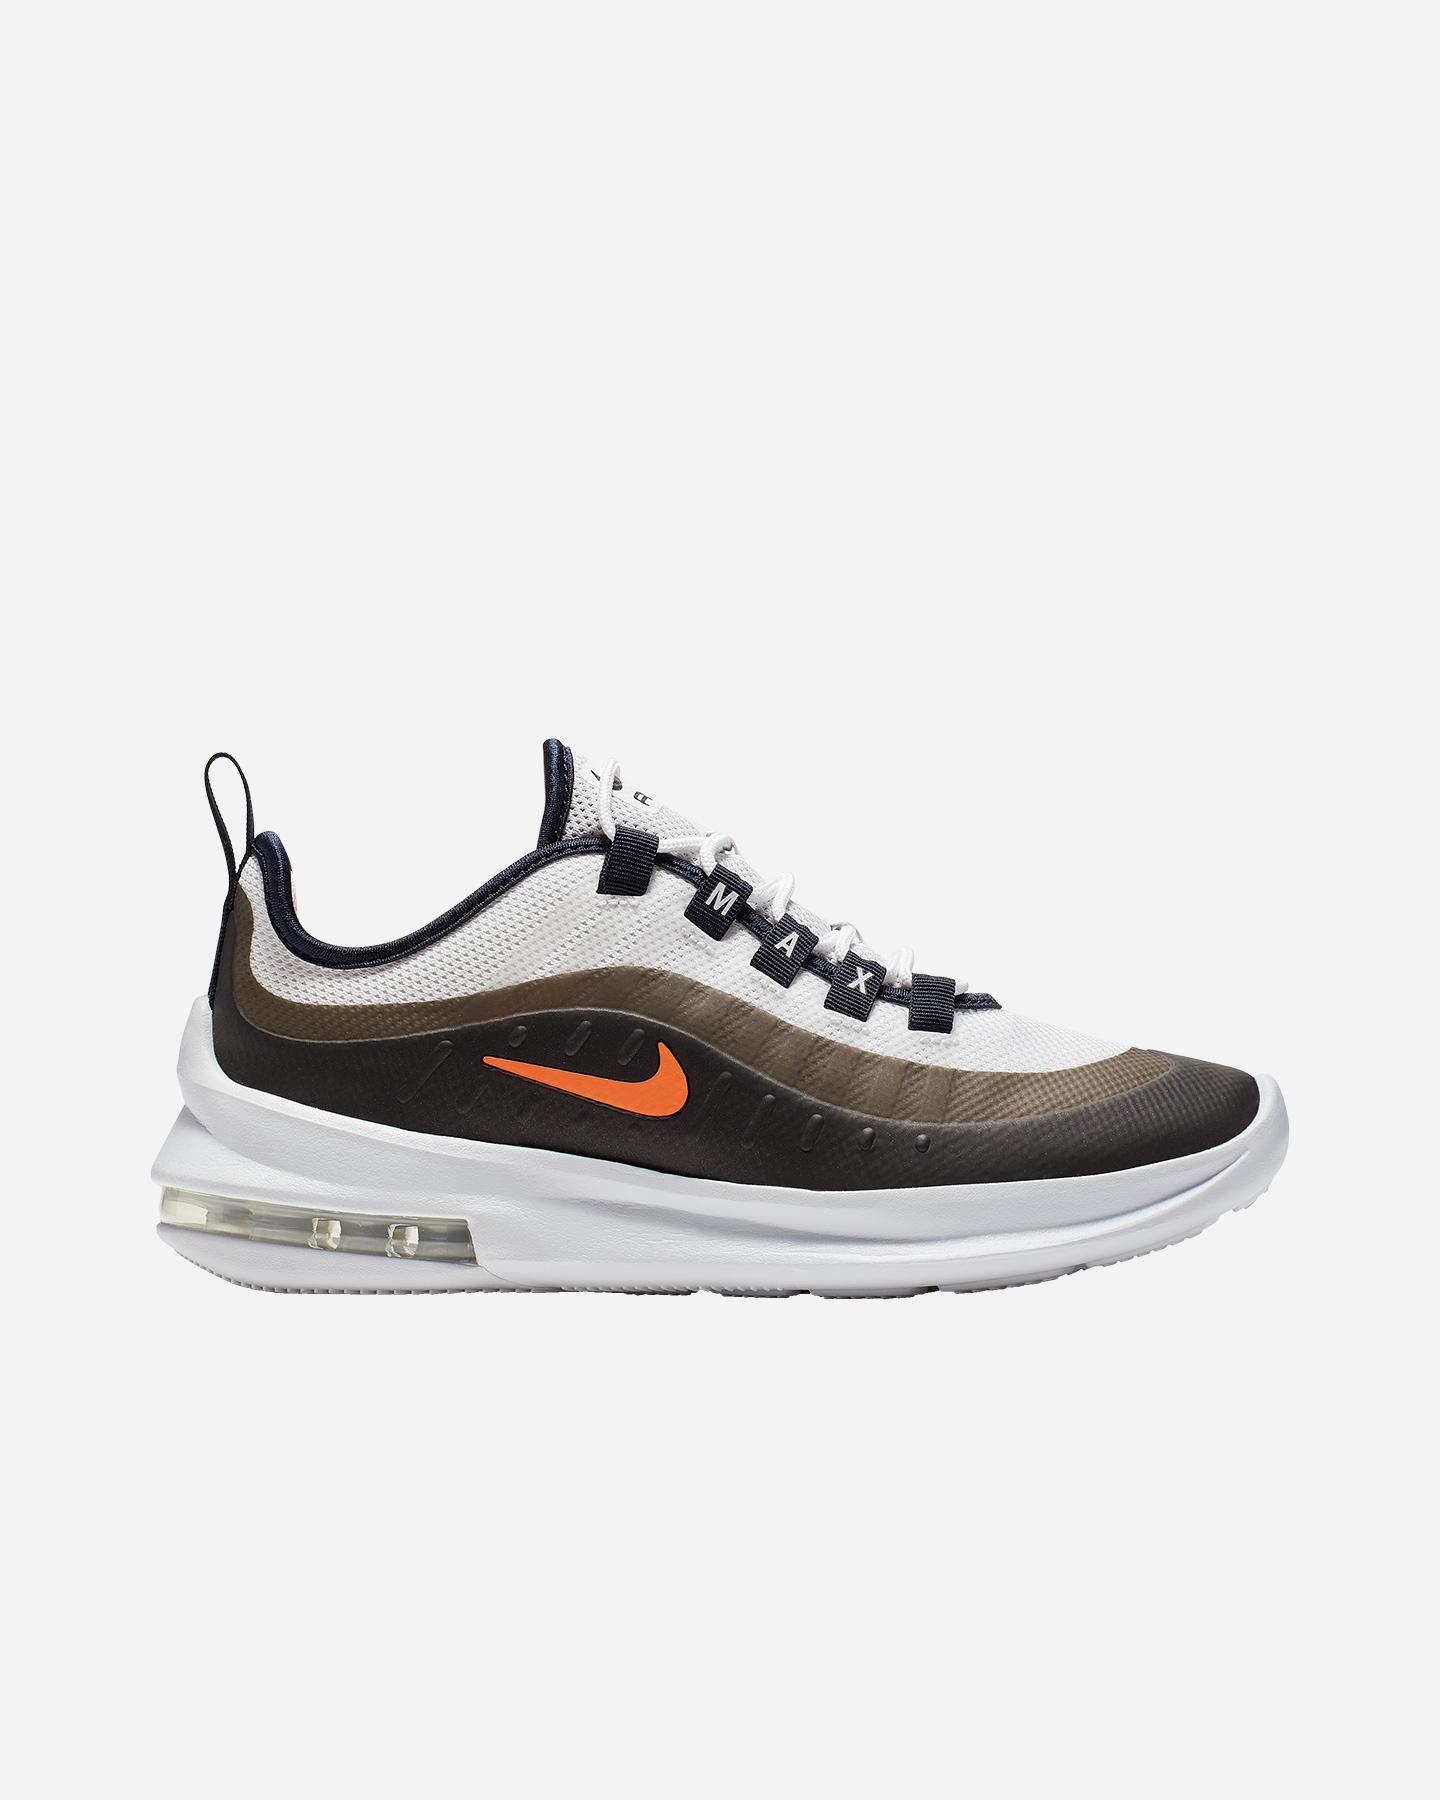 Scarpe Sneakers Nike Air Max Axis Jr Gs AH5222 007 | Cisalfa